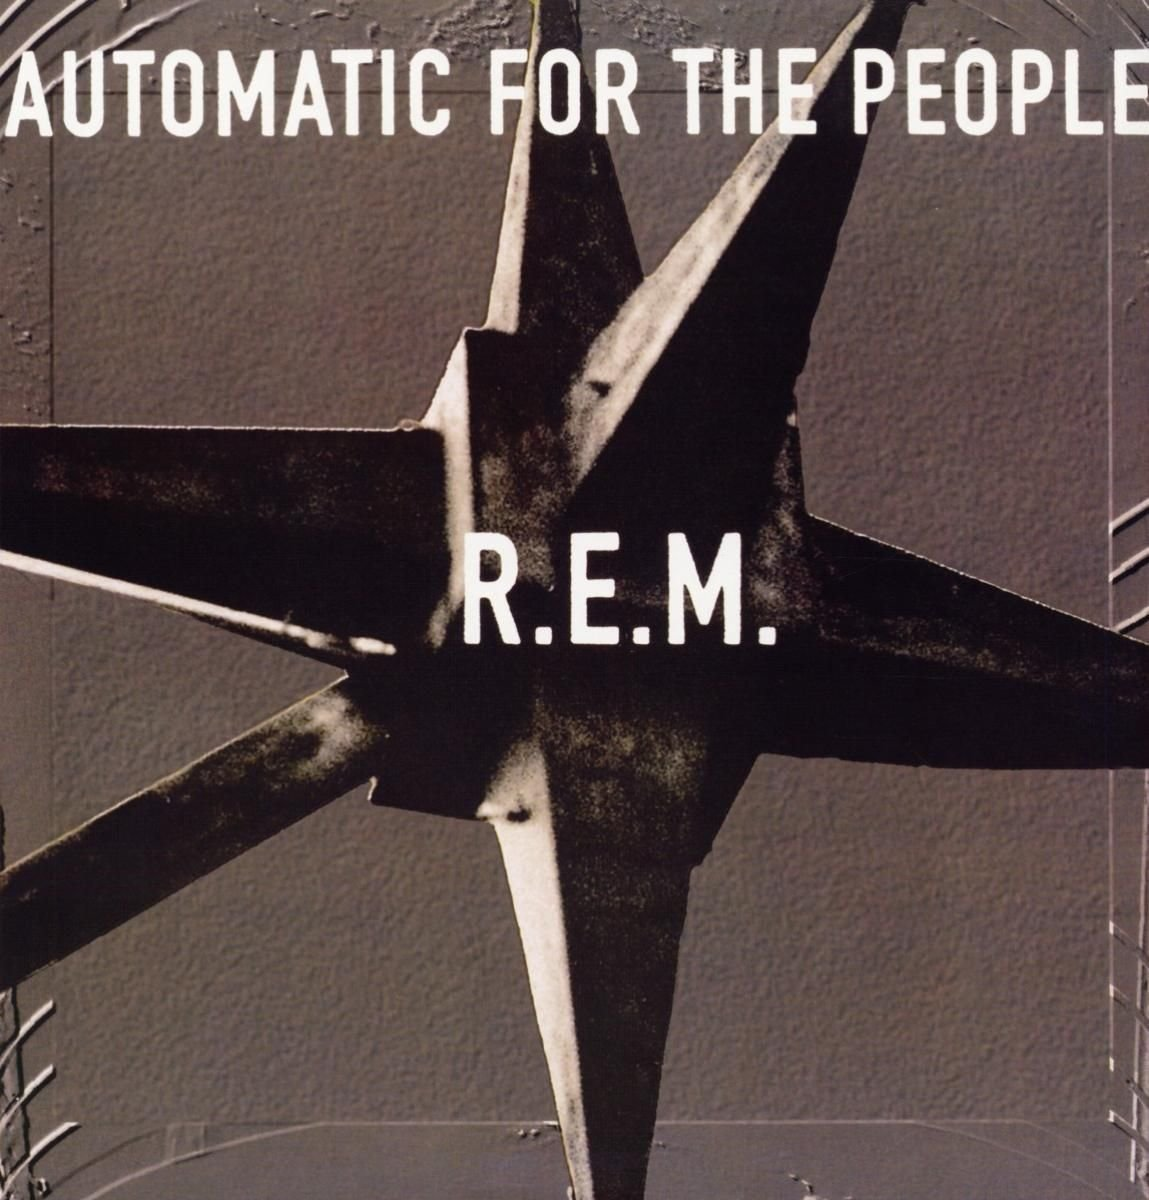 R.E.M.Виниловые пластинки<br>Виниловая пластинка<br>